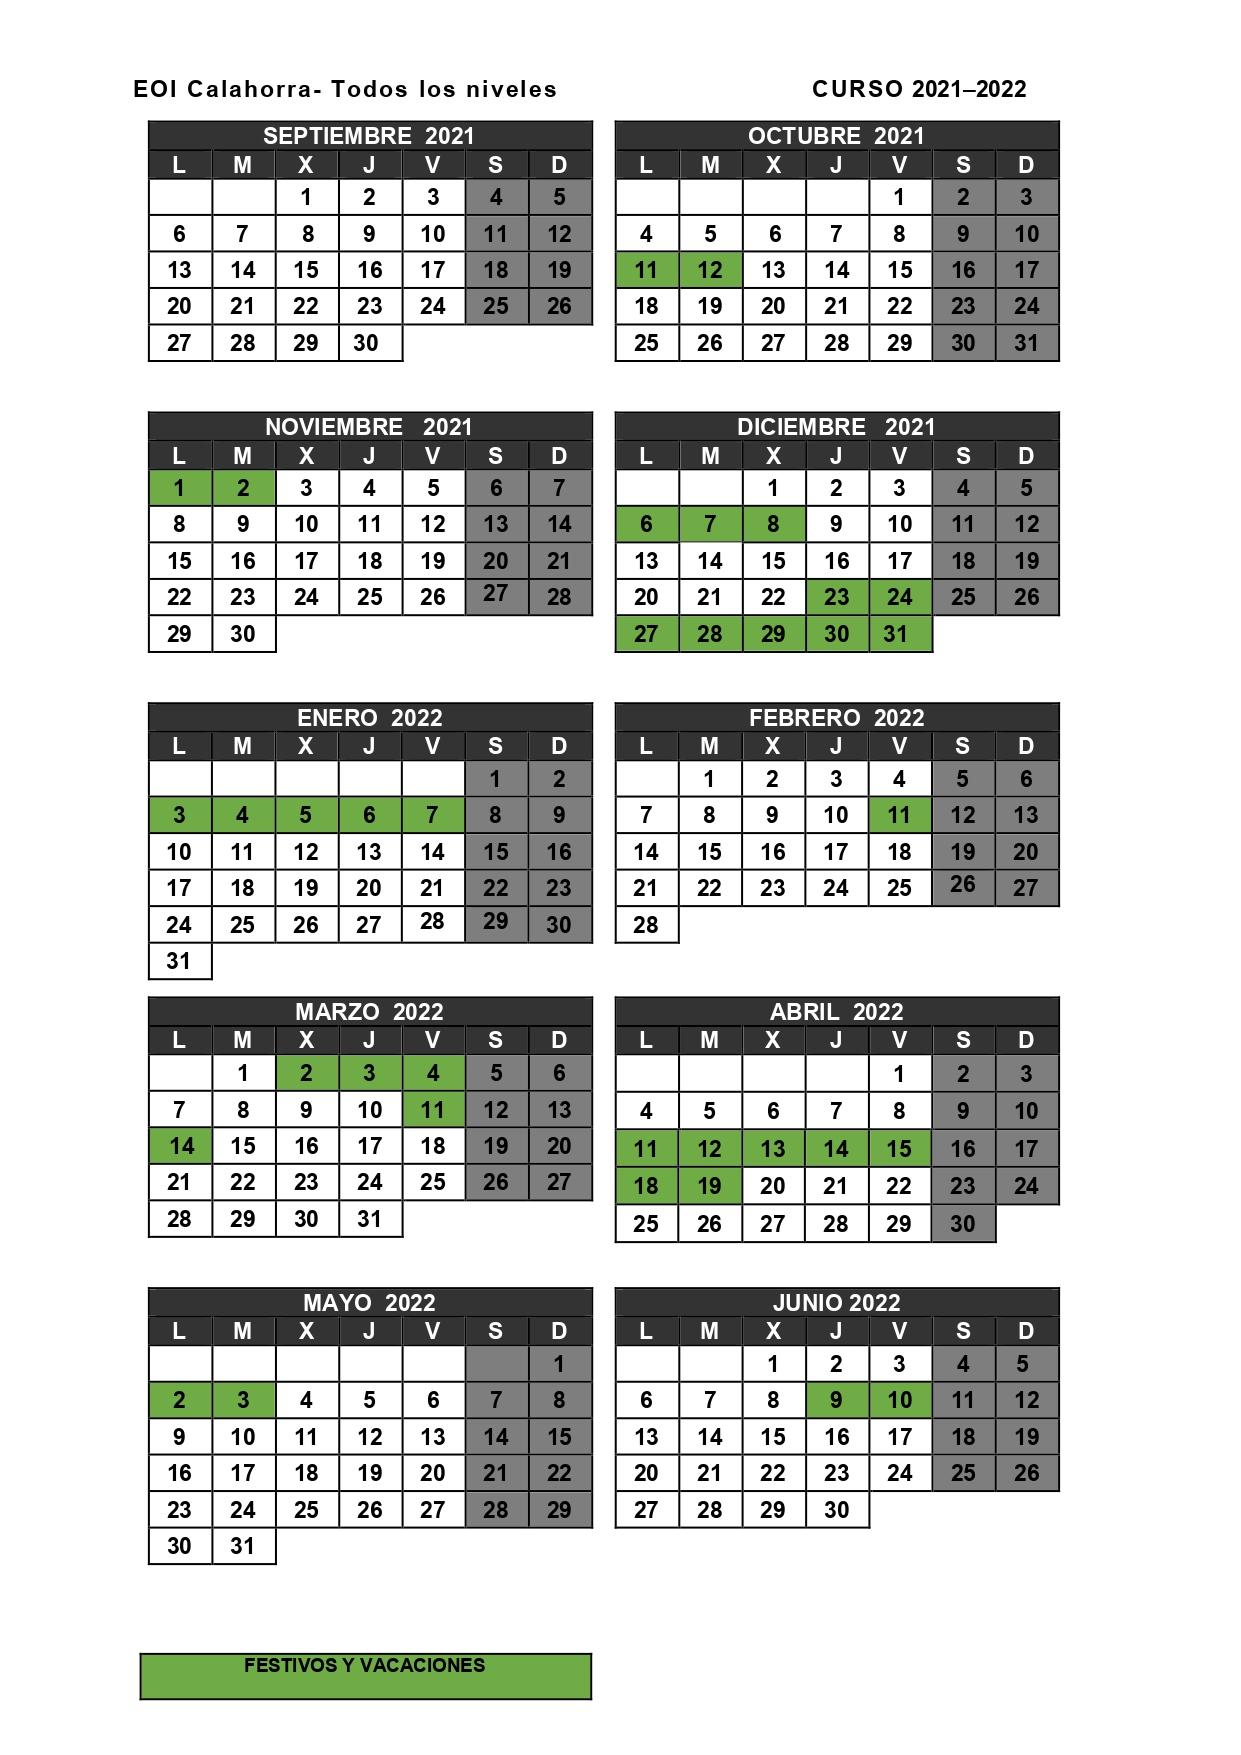 Calendario Calahorra 2020-2021